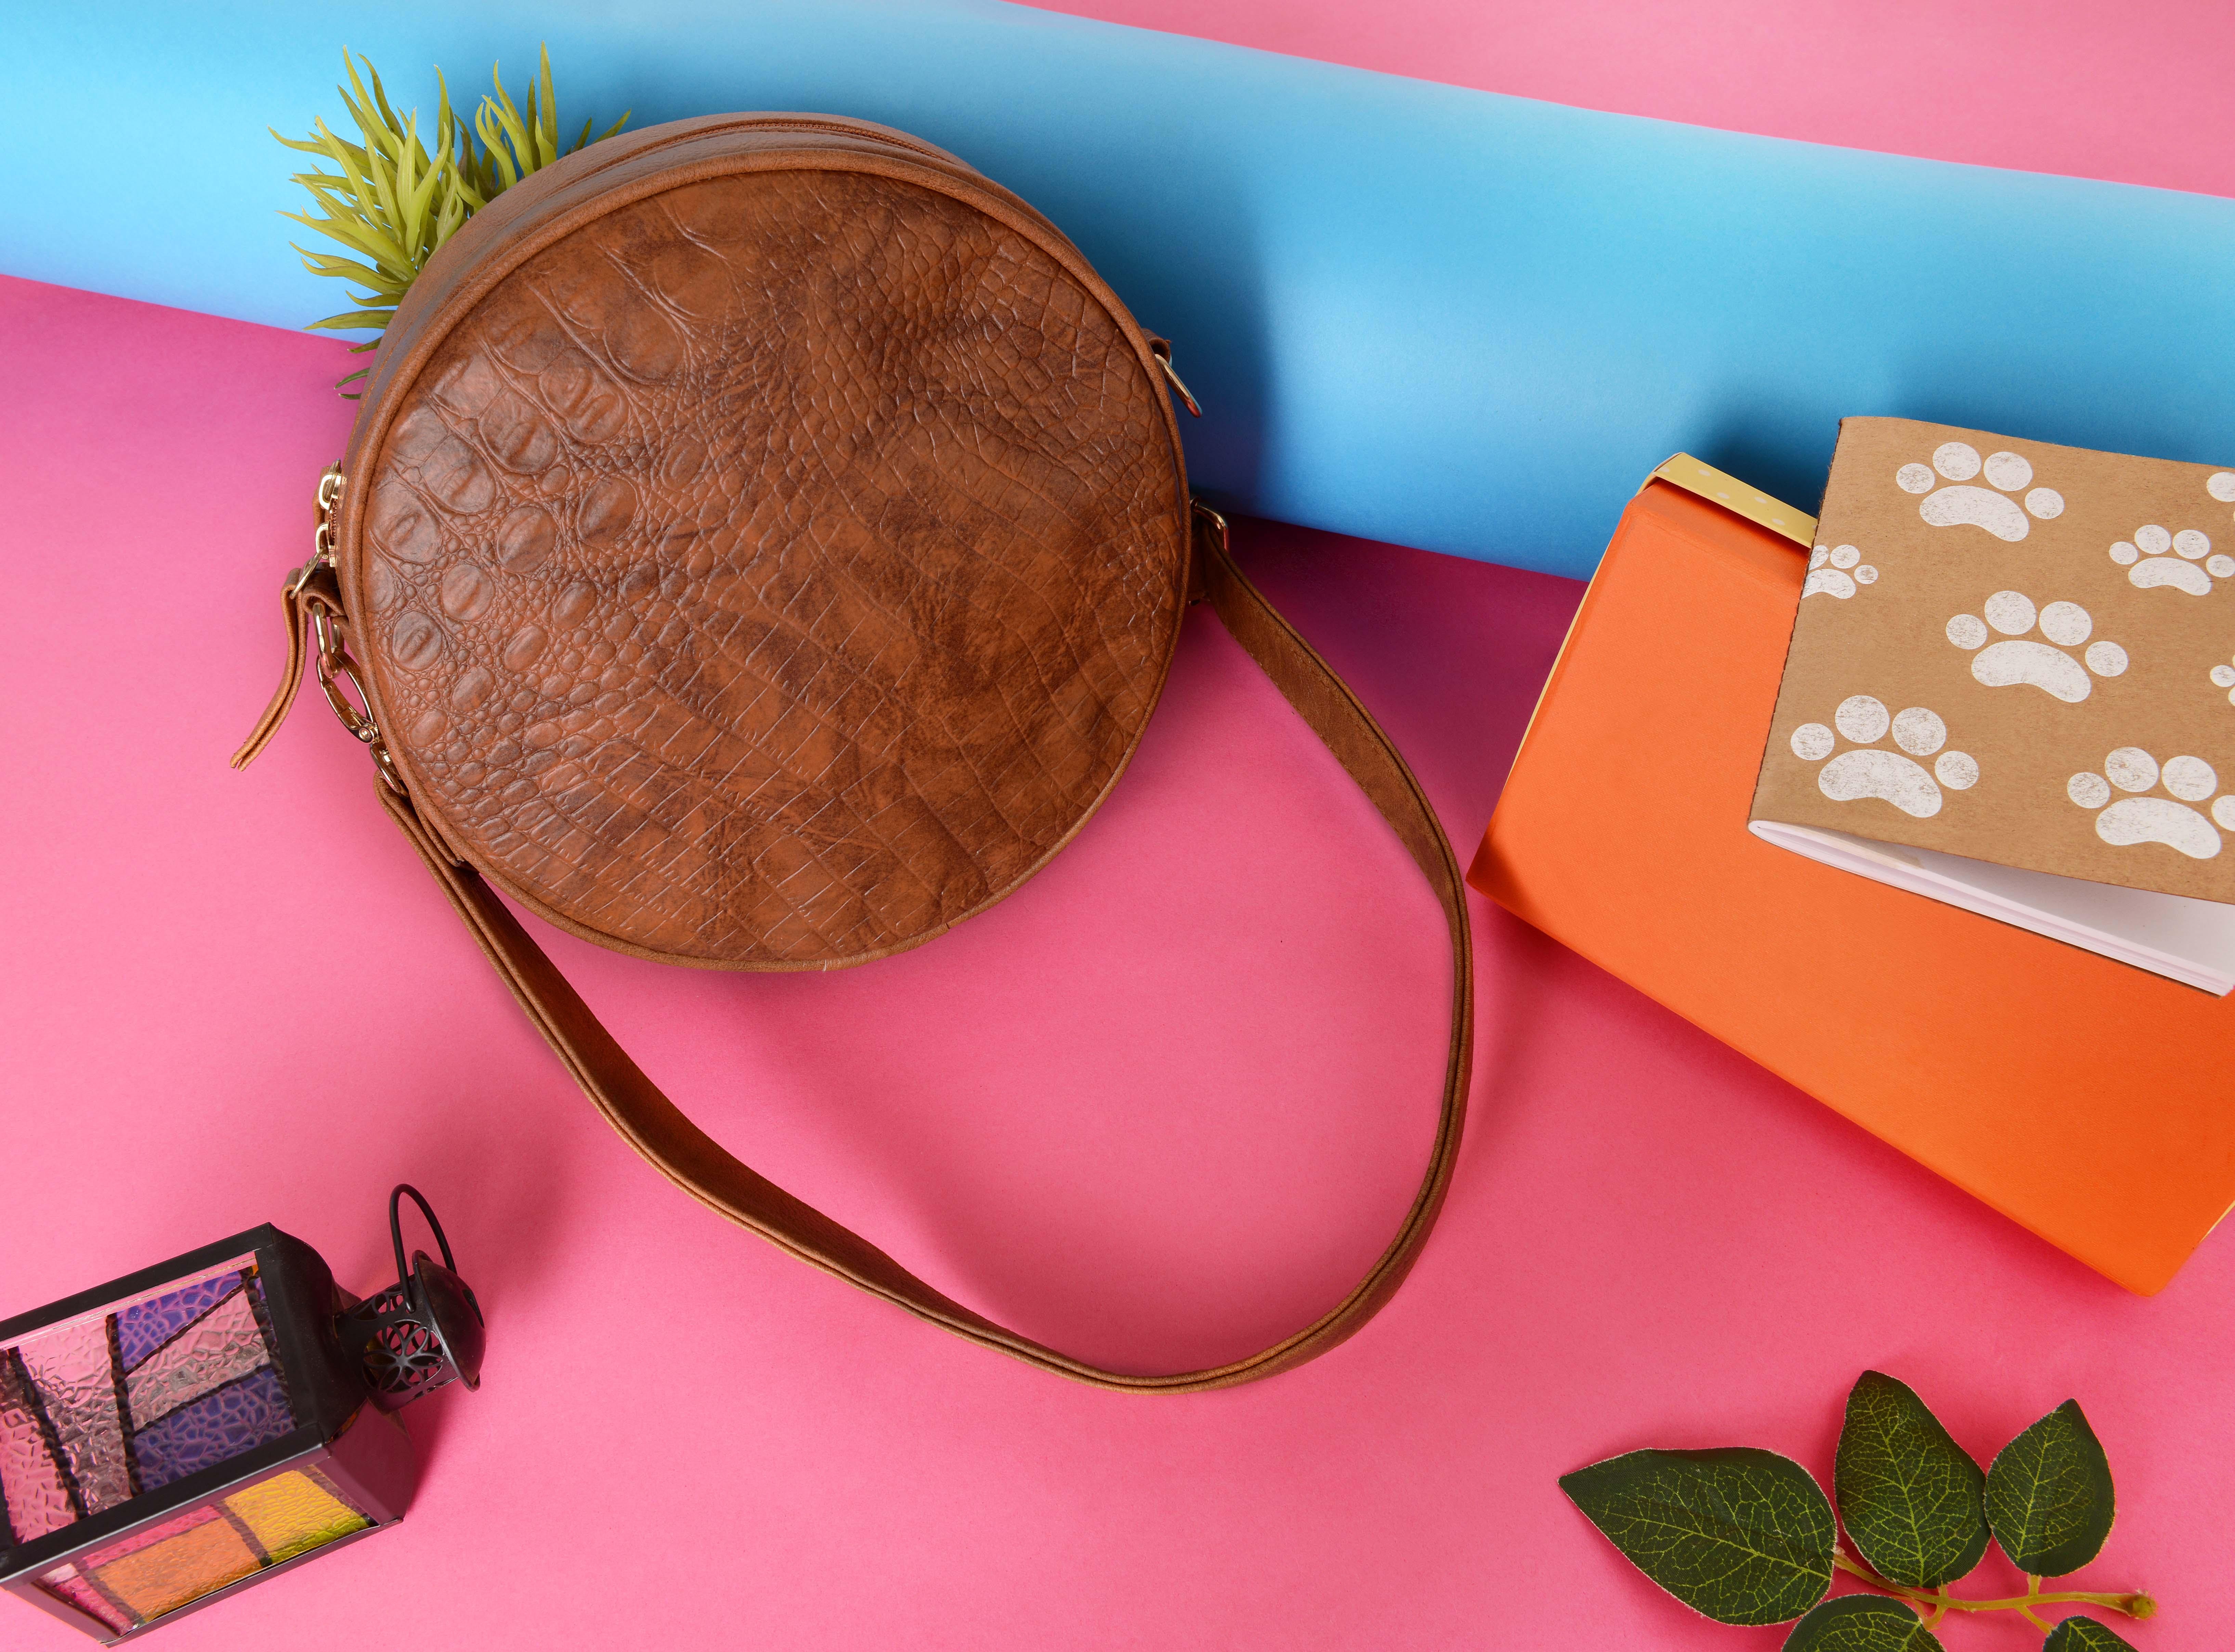 Vivinkaa | Vivinkaa Vegan Leather Tan Croco Textured Round Casual Sling Bag